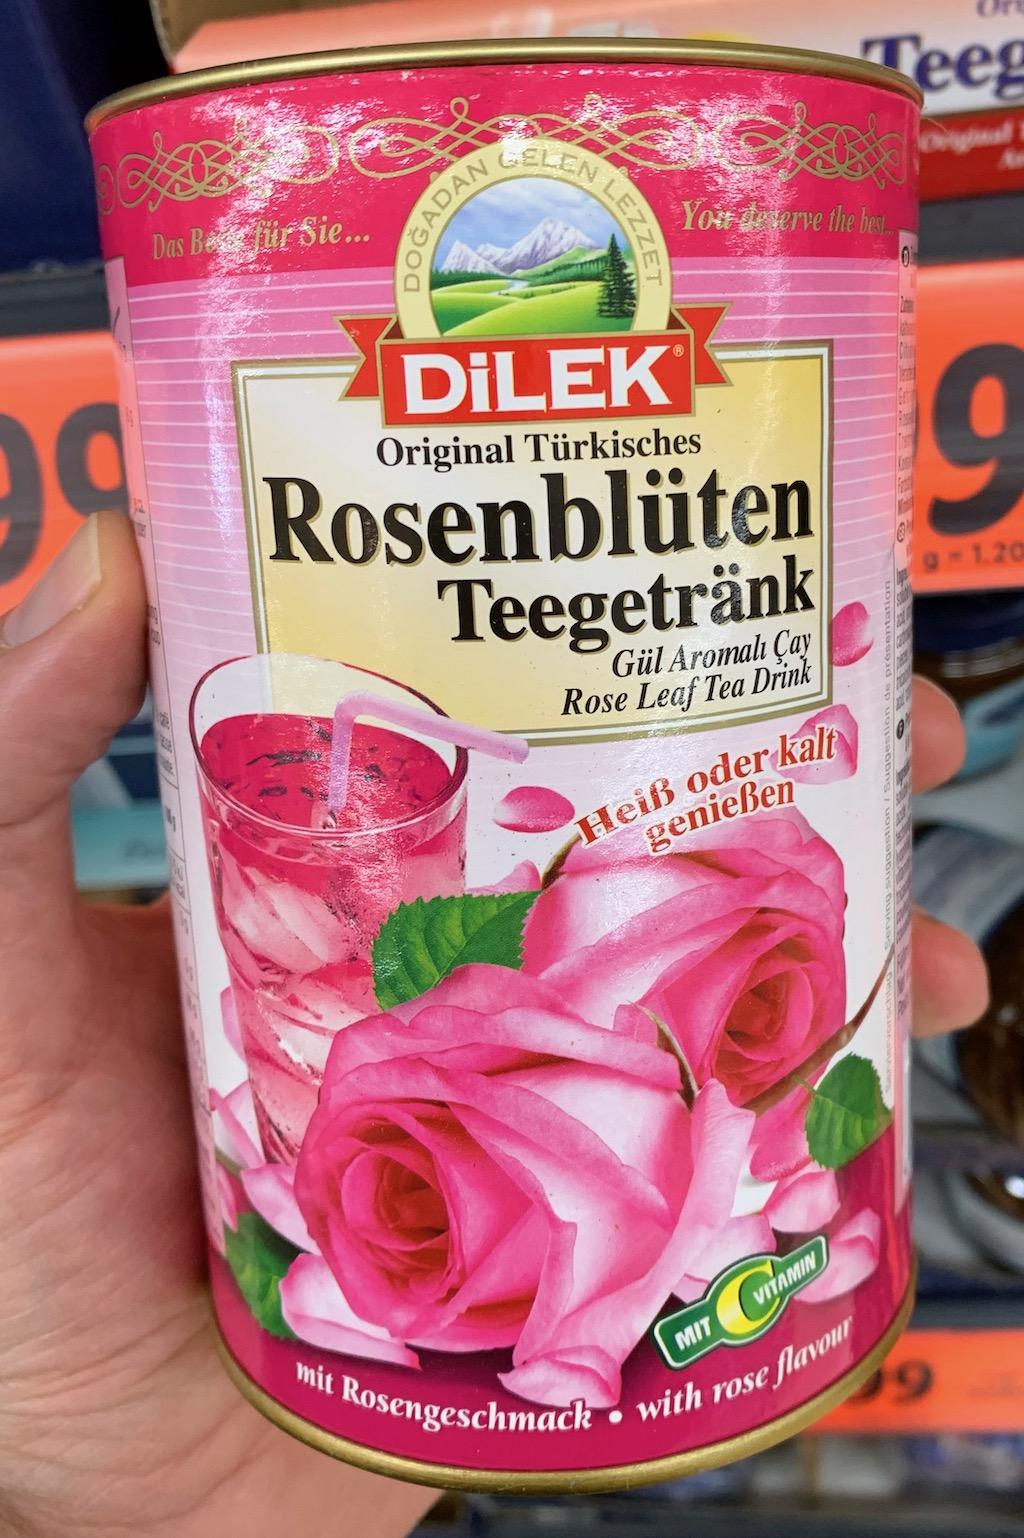 Dilek lösliches Teegetränk Rosenblüten